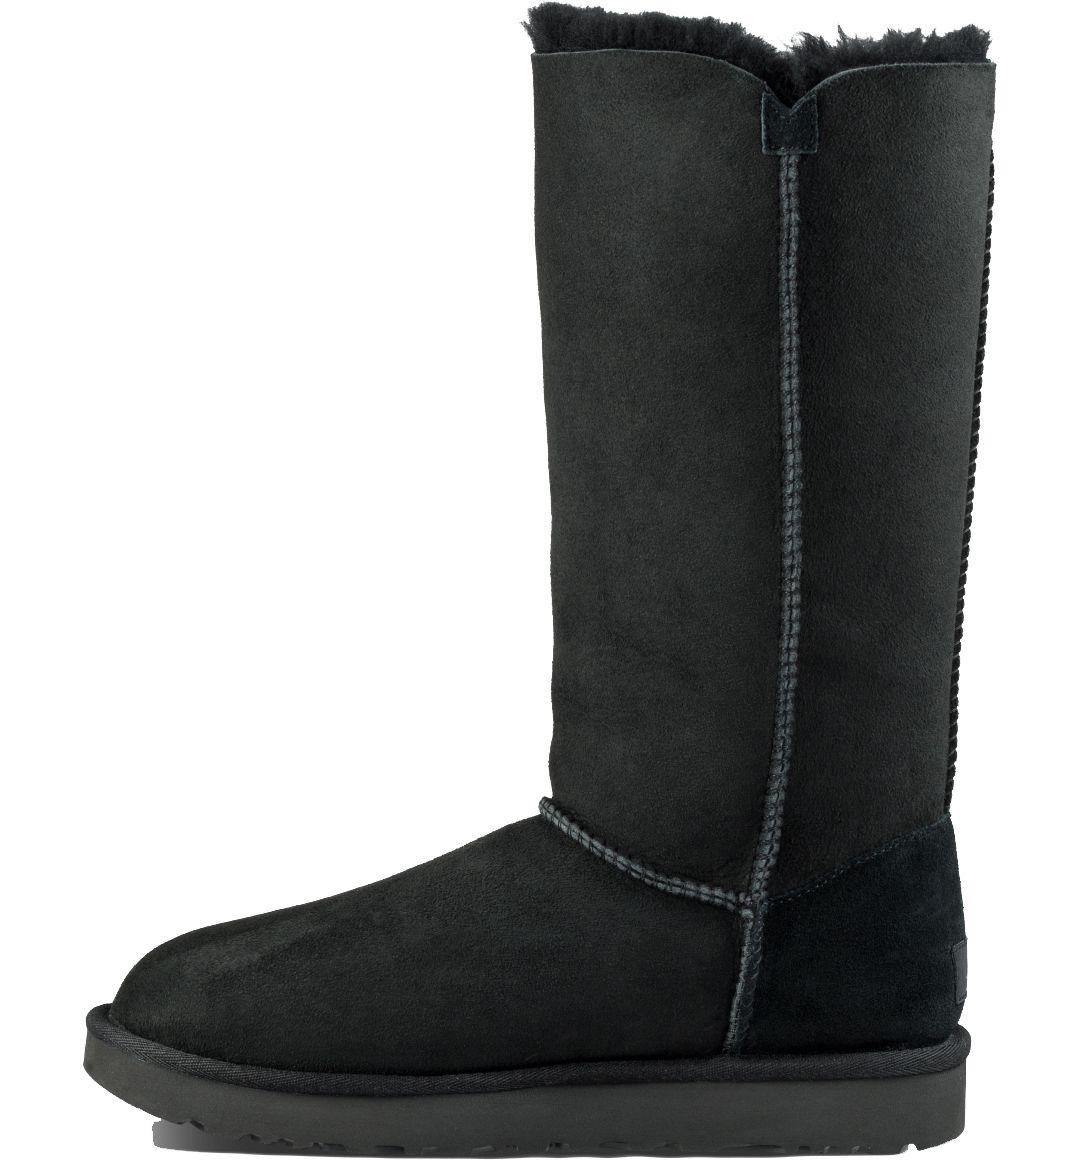 437430c5fb4 UGG Australia Women's Bailey Button Triplet II Winter Boots